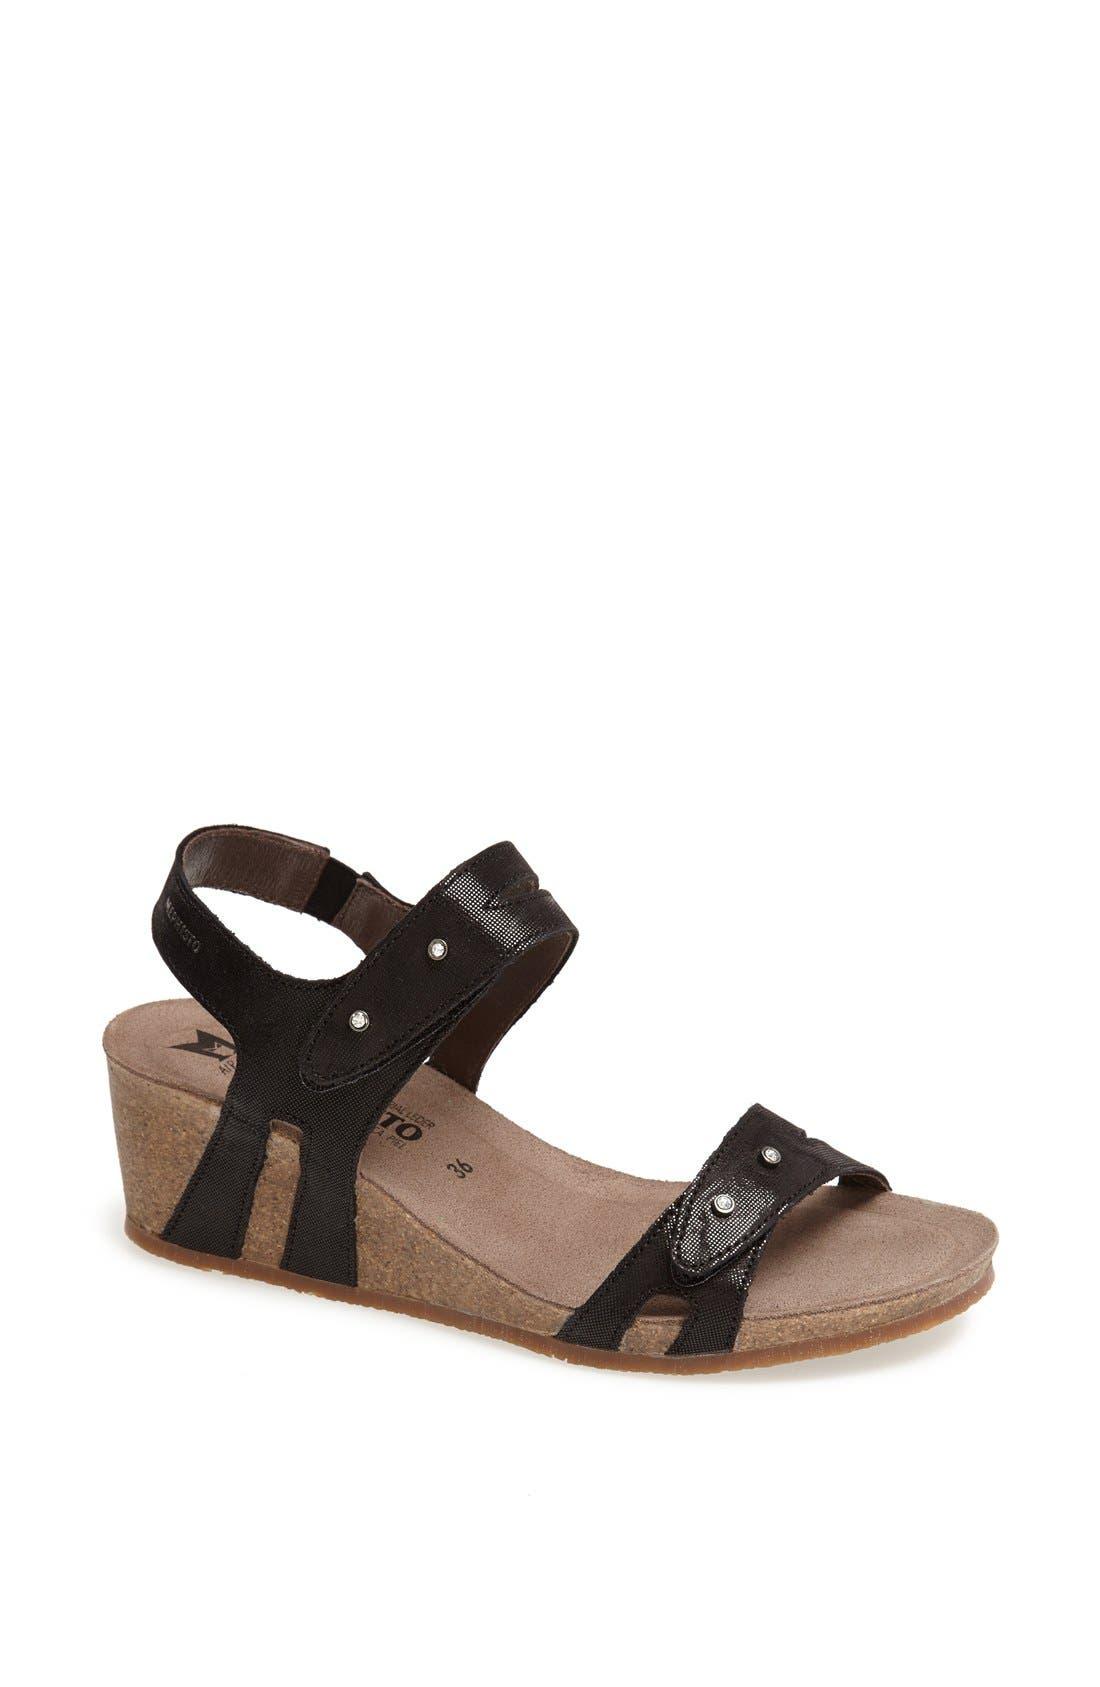 'Minoa' Wedge Sandal,                         Main,                         color, BLACK